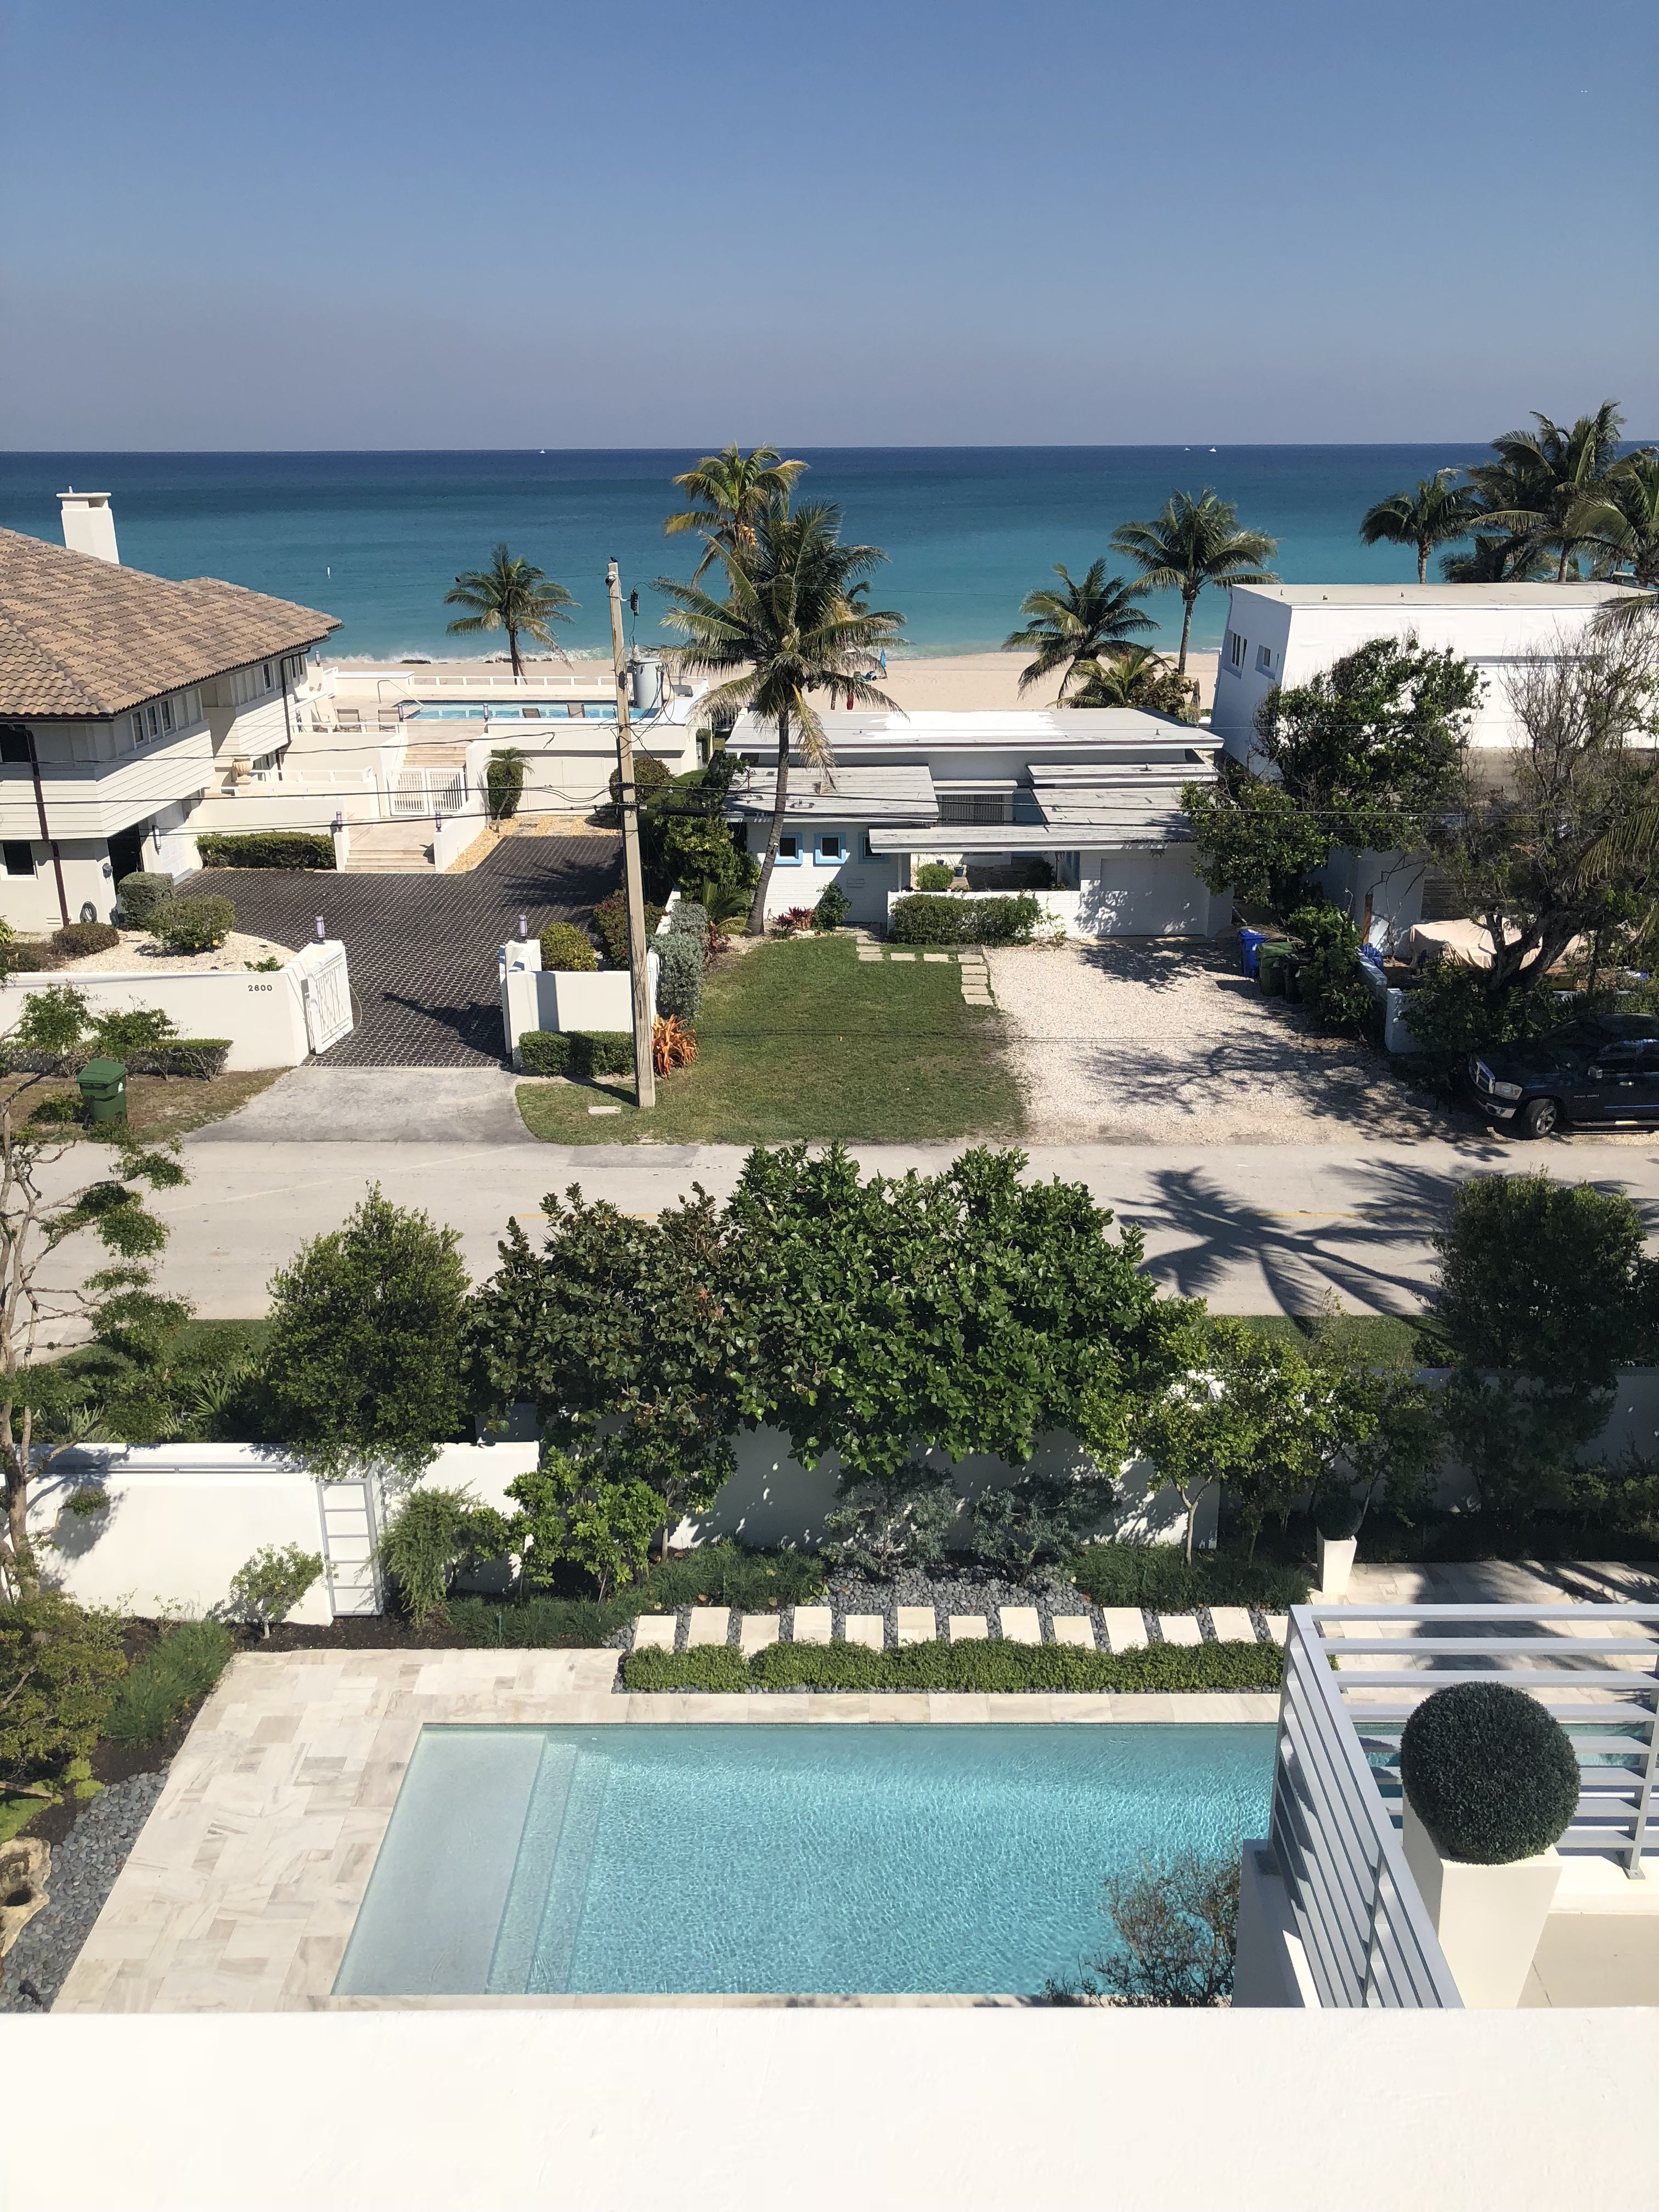 Renaissance Cruise Port Hotel Fort Lauderdale